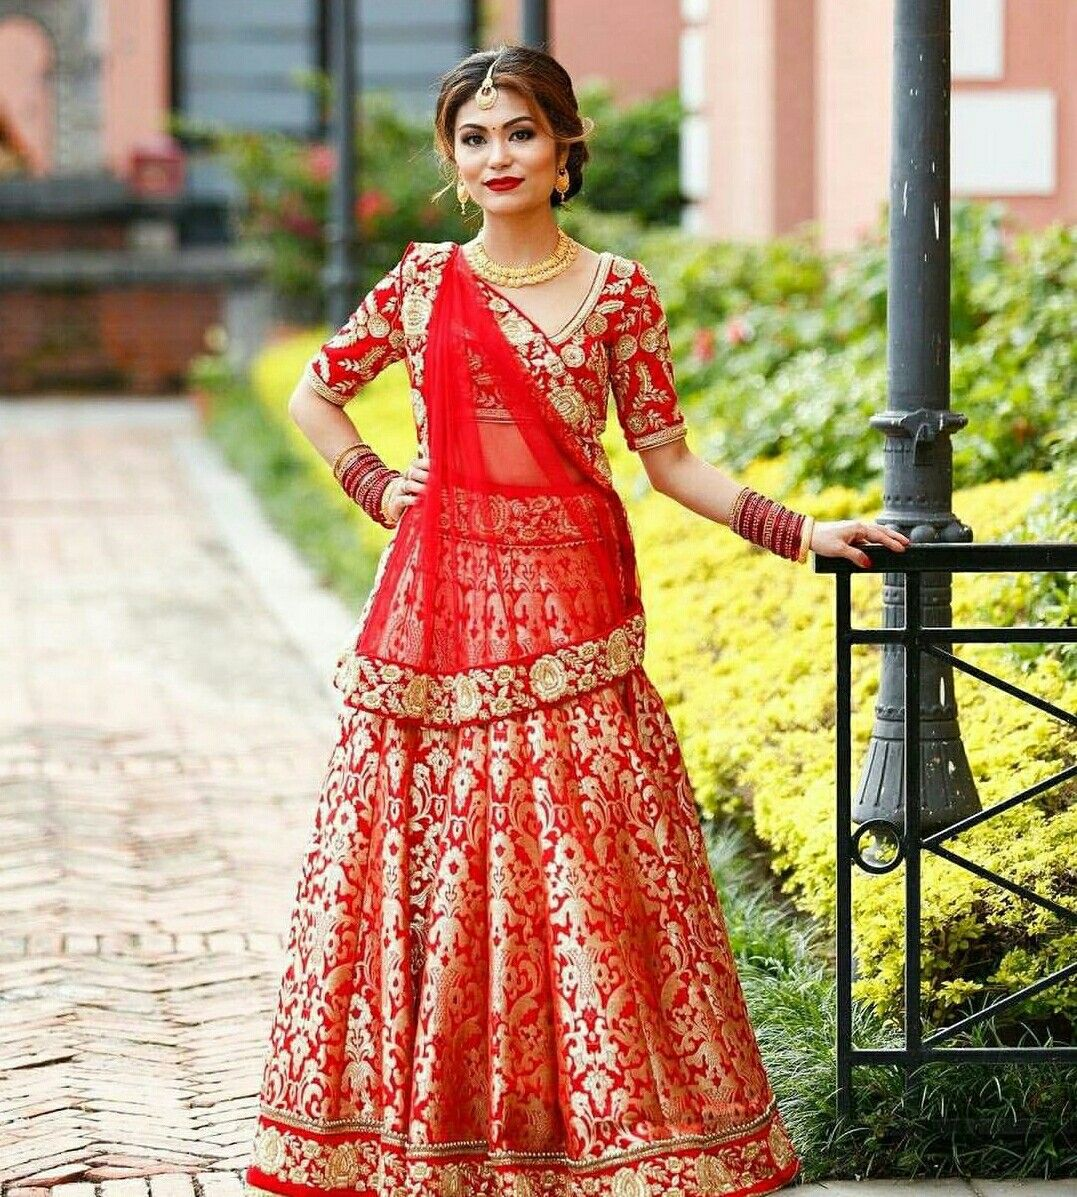 #nepali #wedding #tradition #nepal #marriage #bride